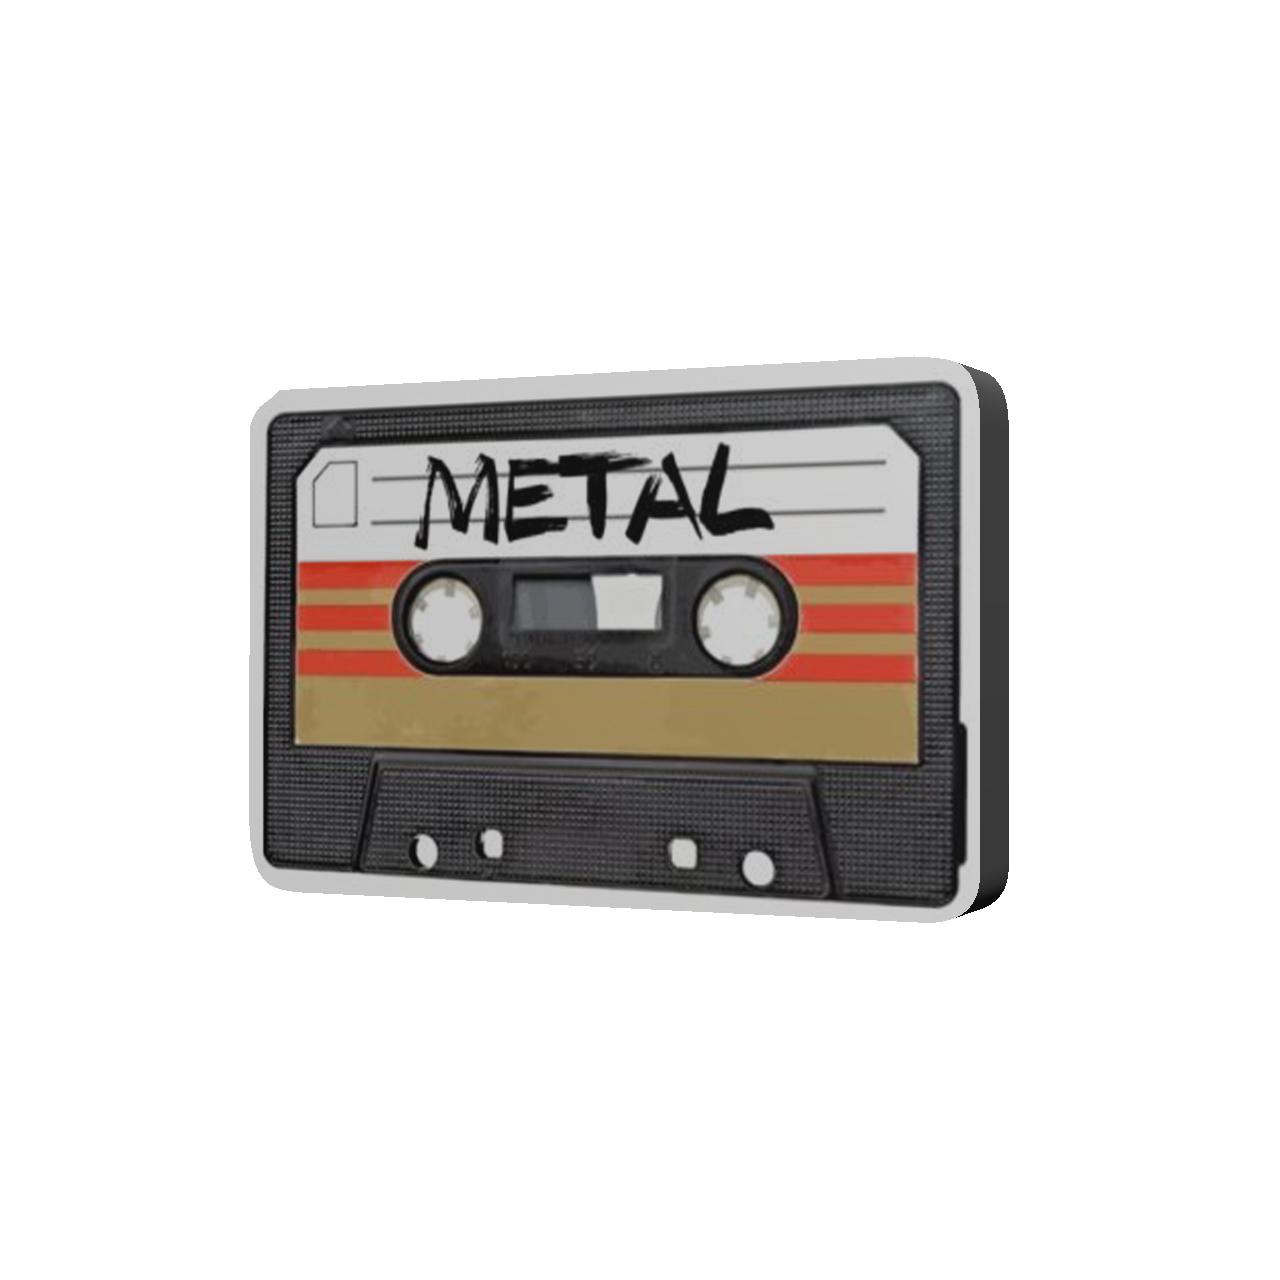 استیکر طرح Metal کد 285